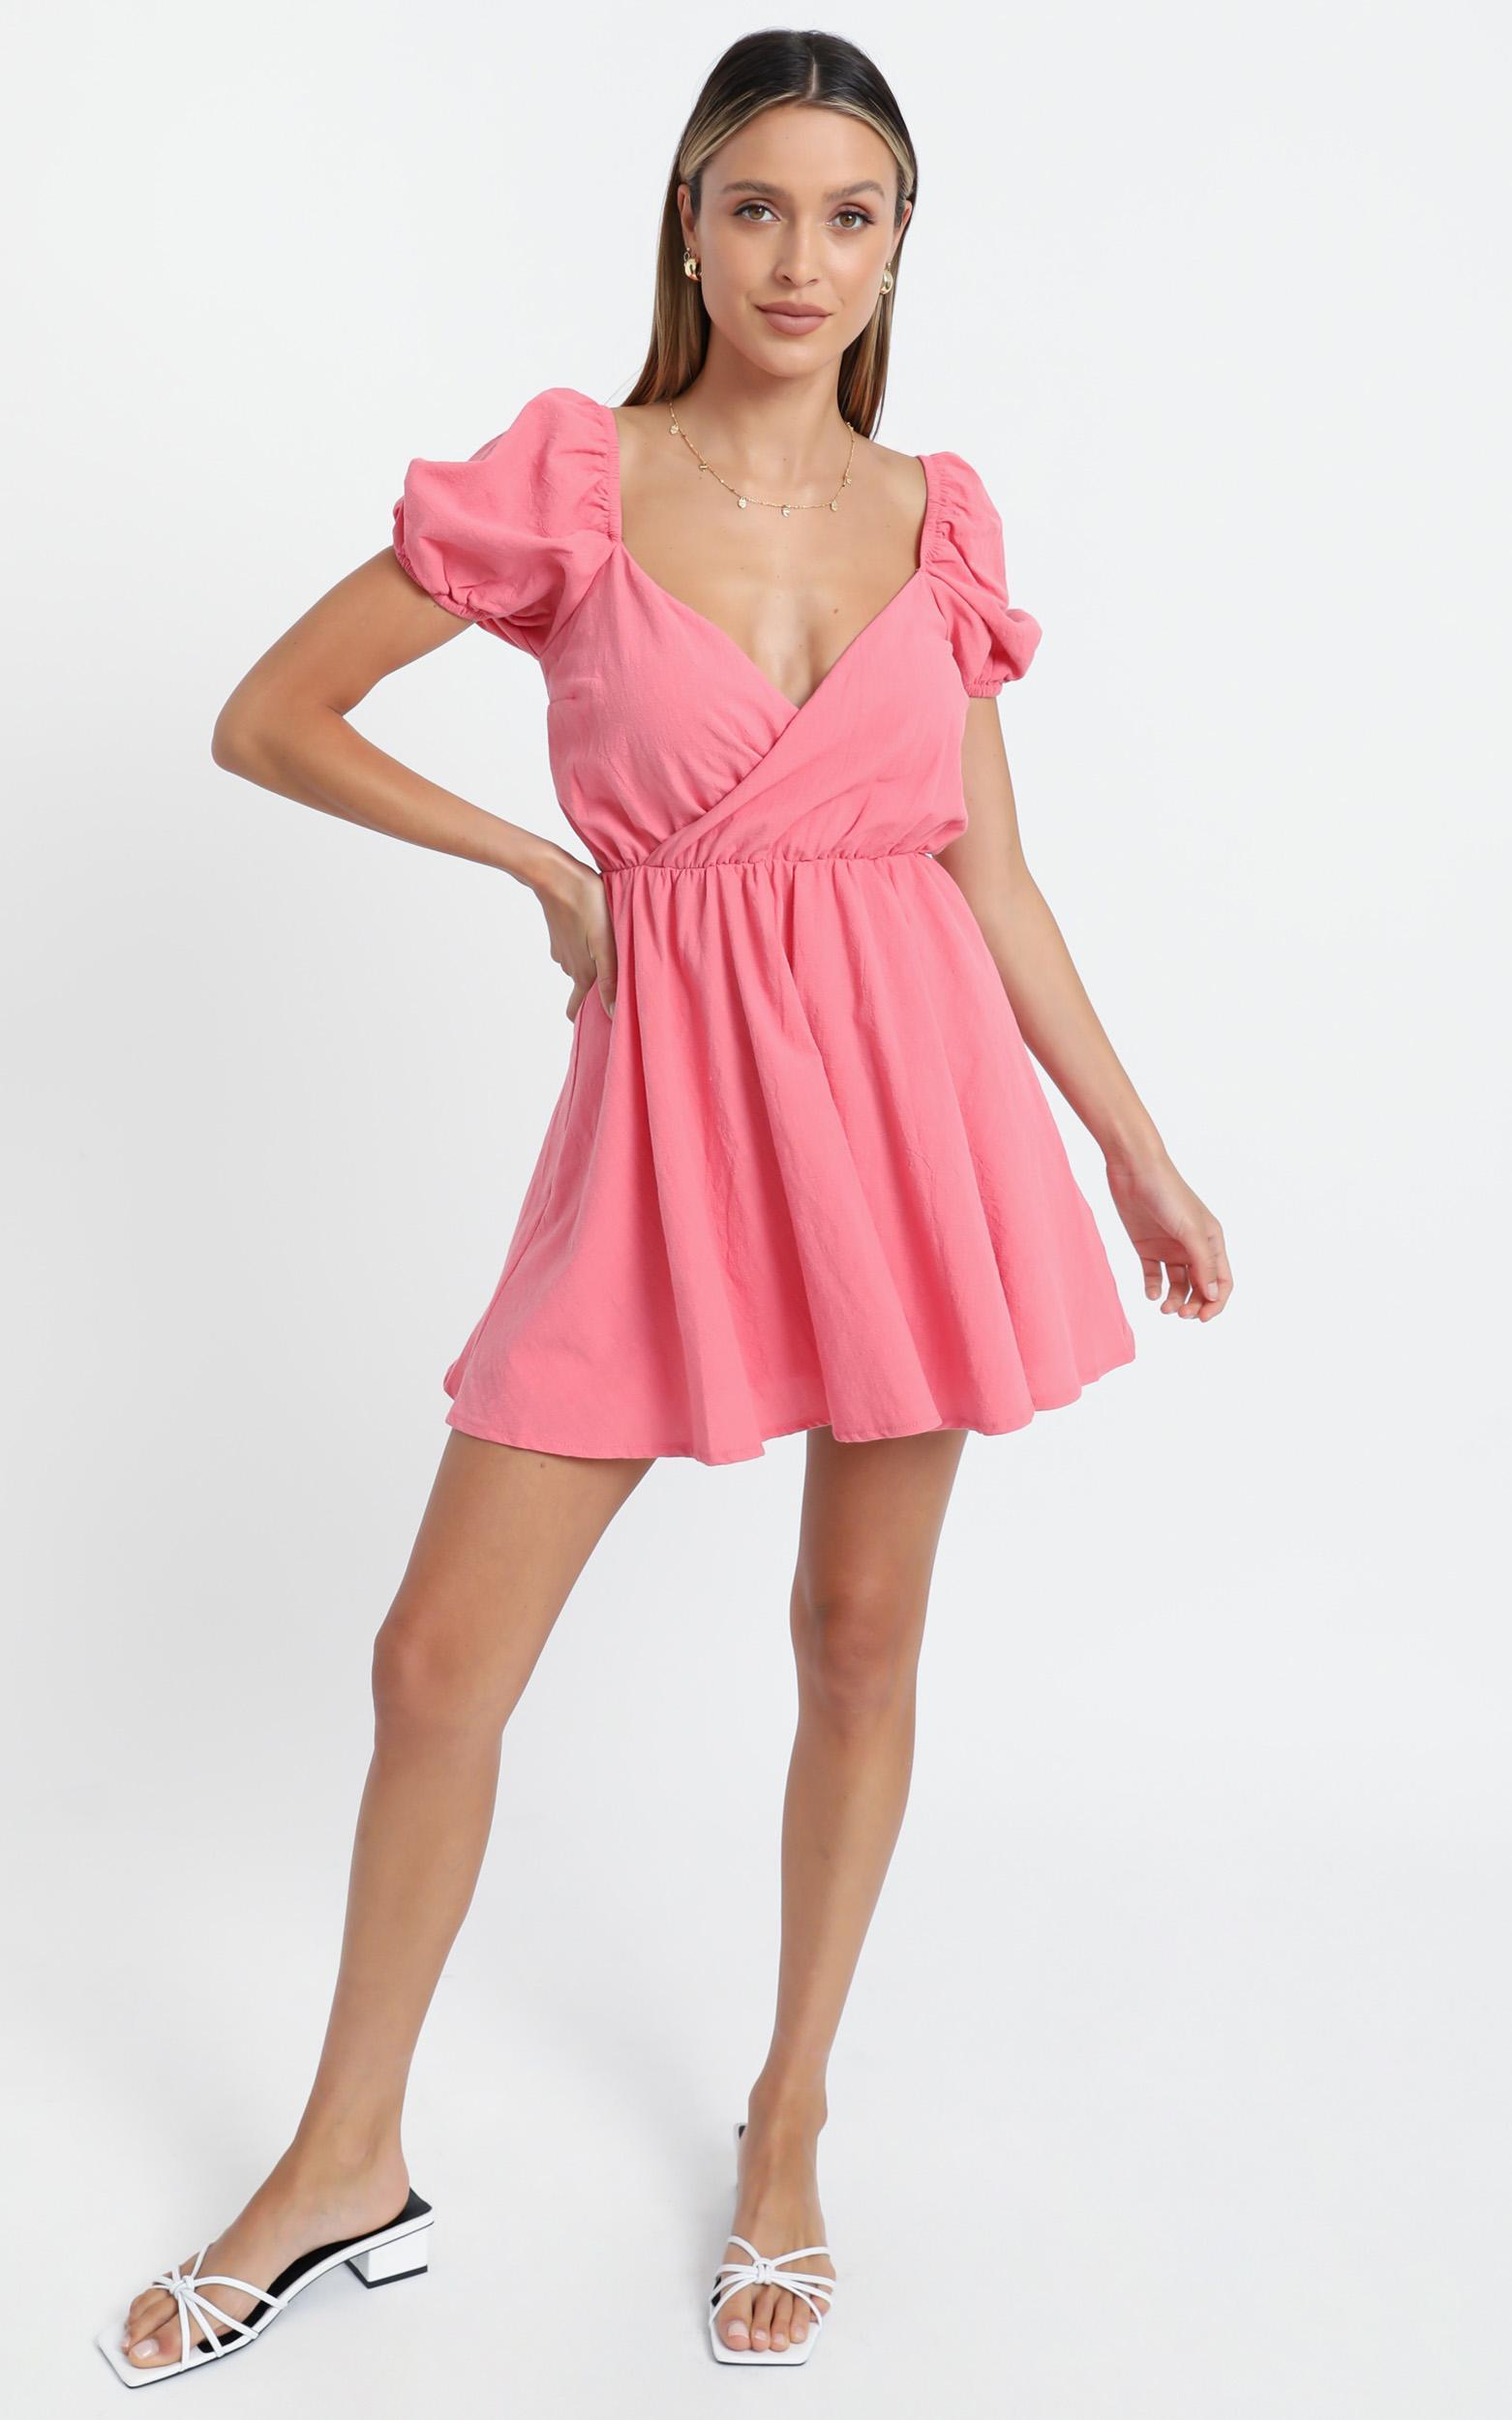 Kamali Dress in Coral, PNK14, hi-res image number null